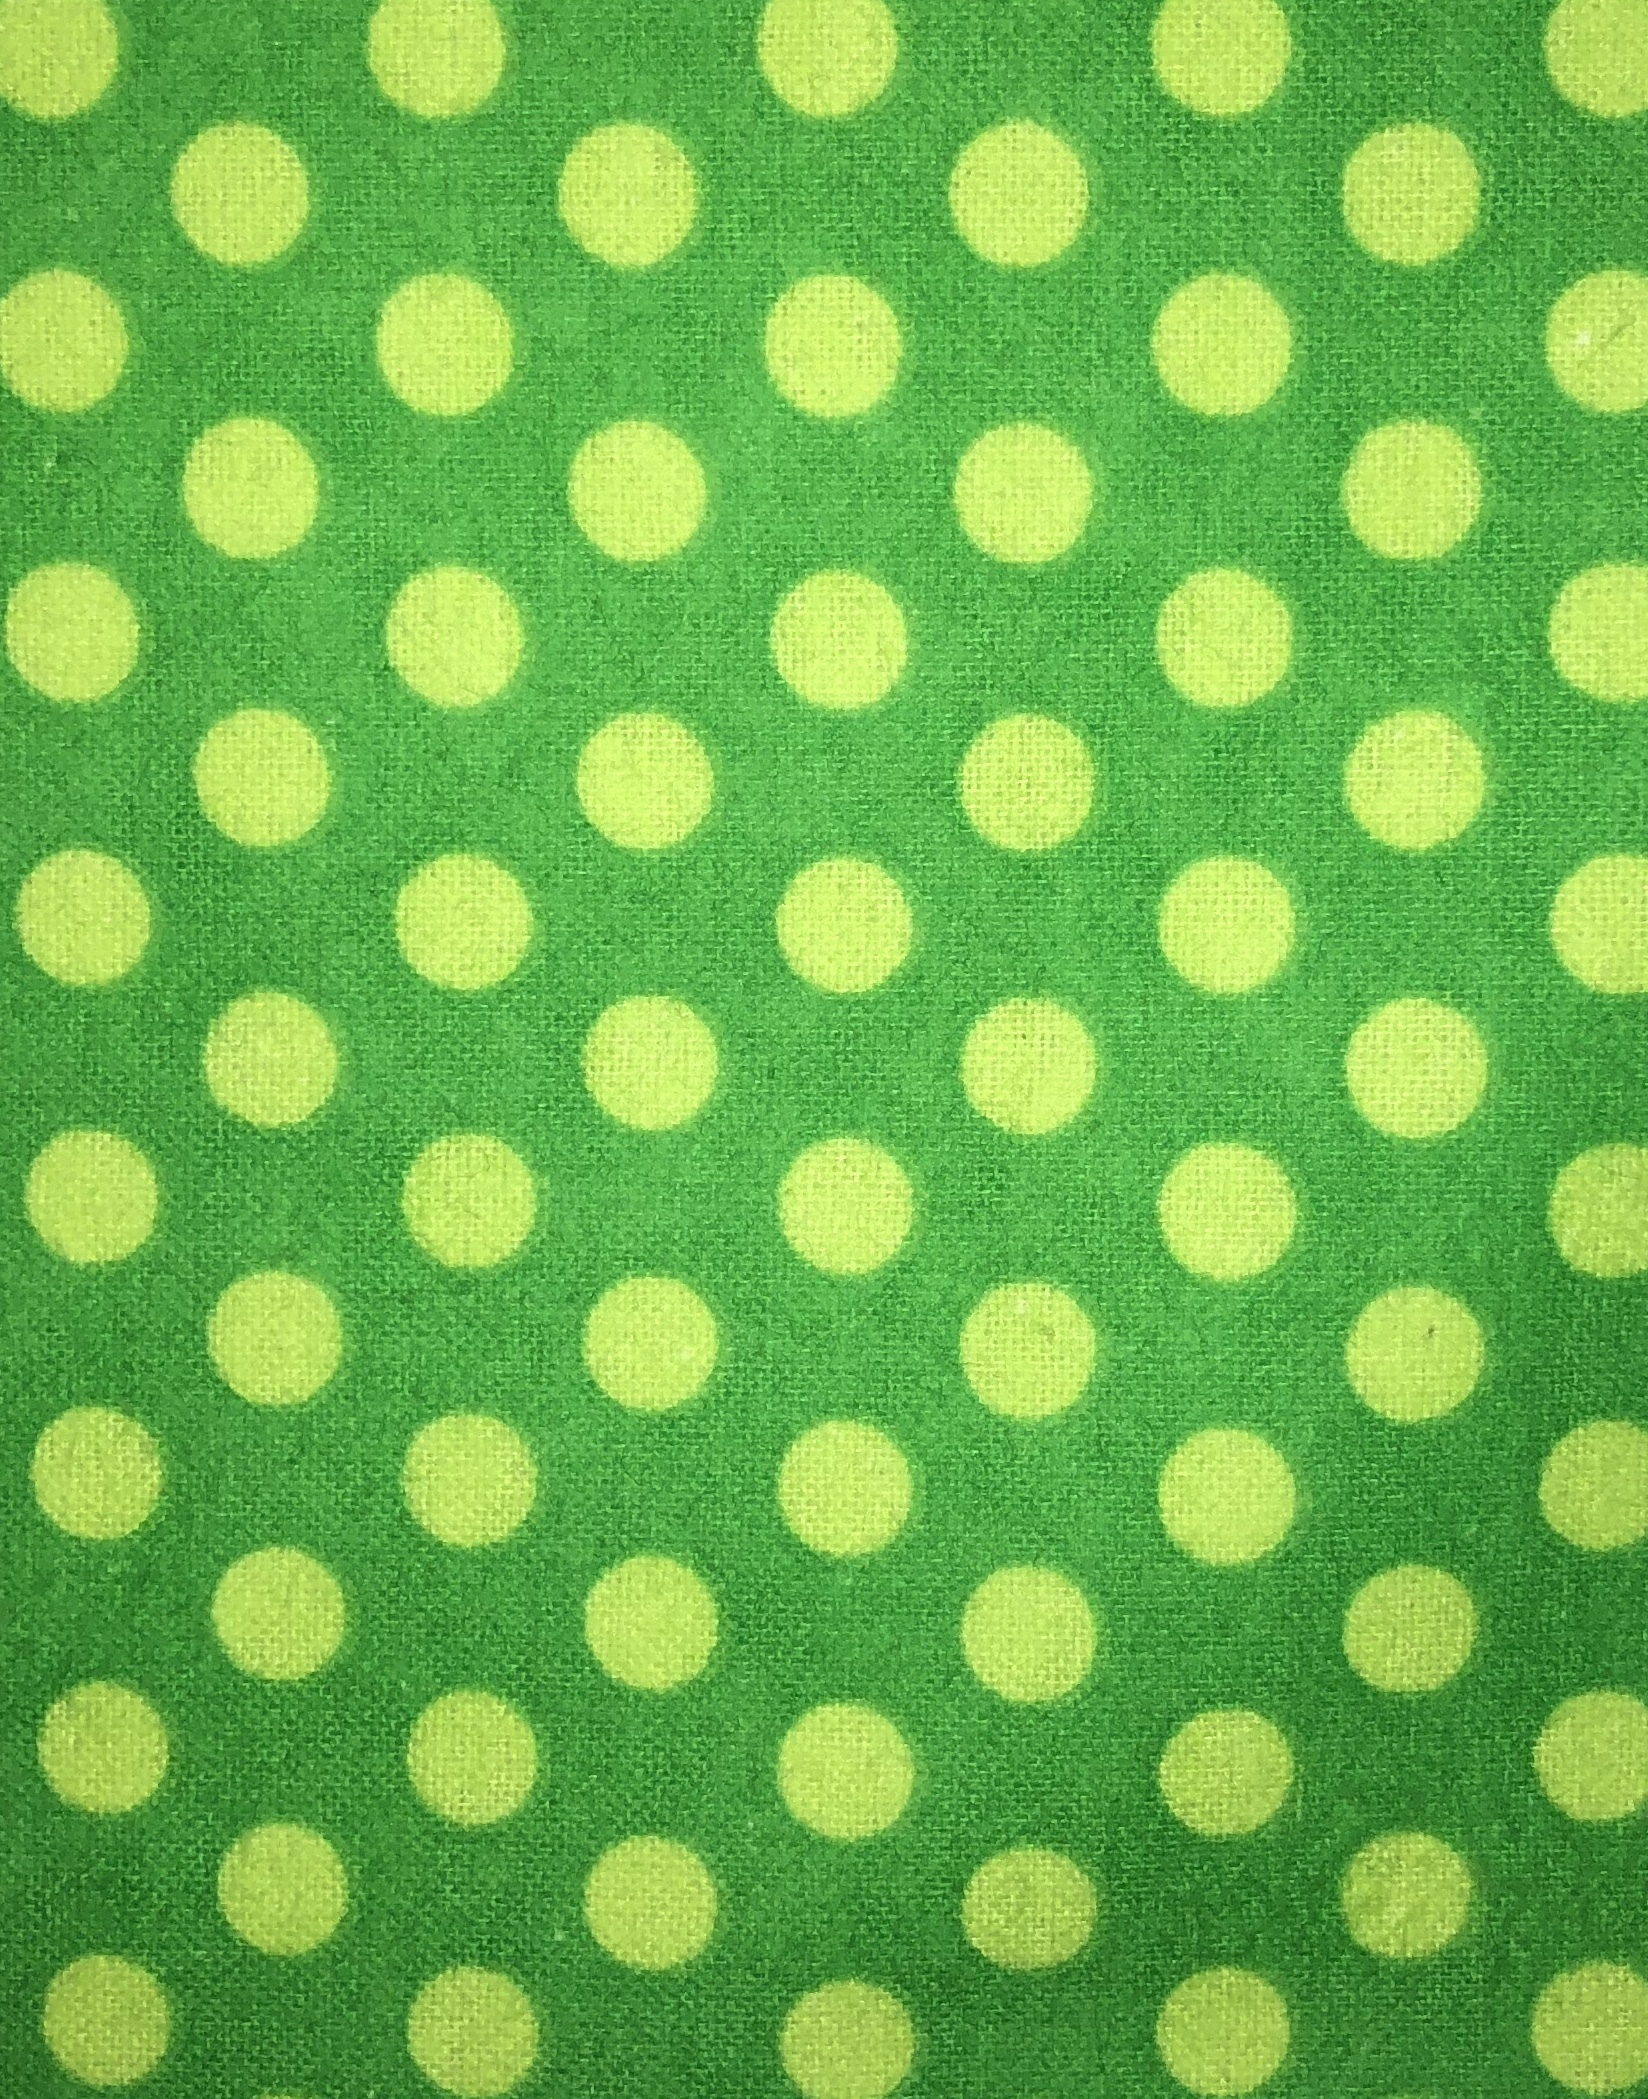 Green Polka Dot Flannel - 1/2m cut 55175